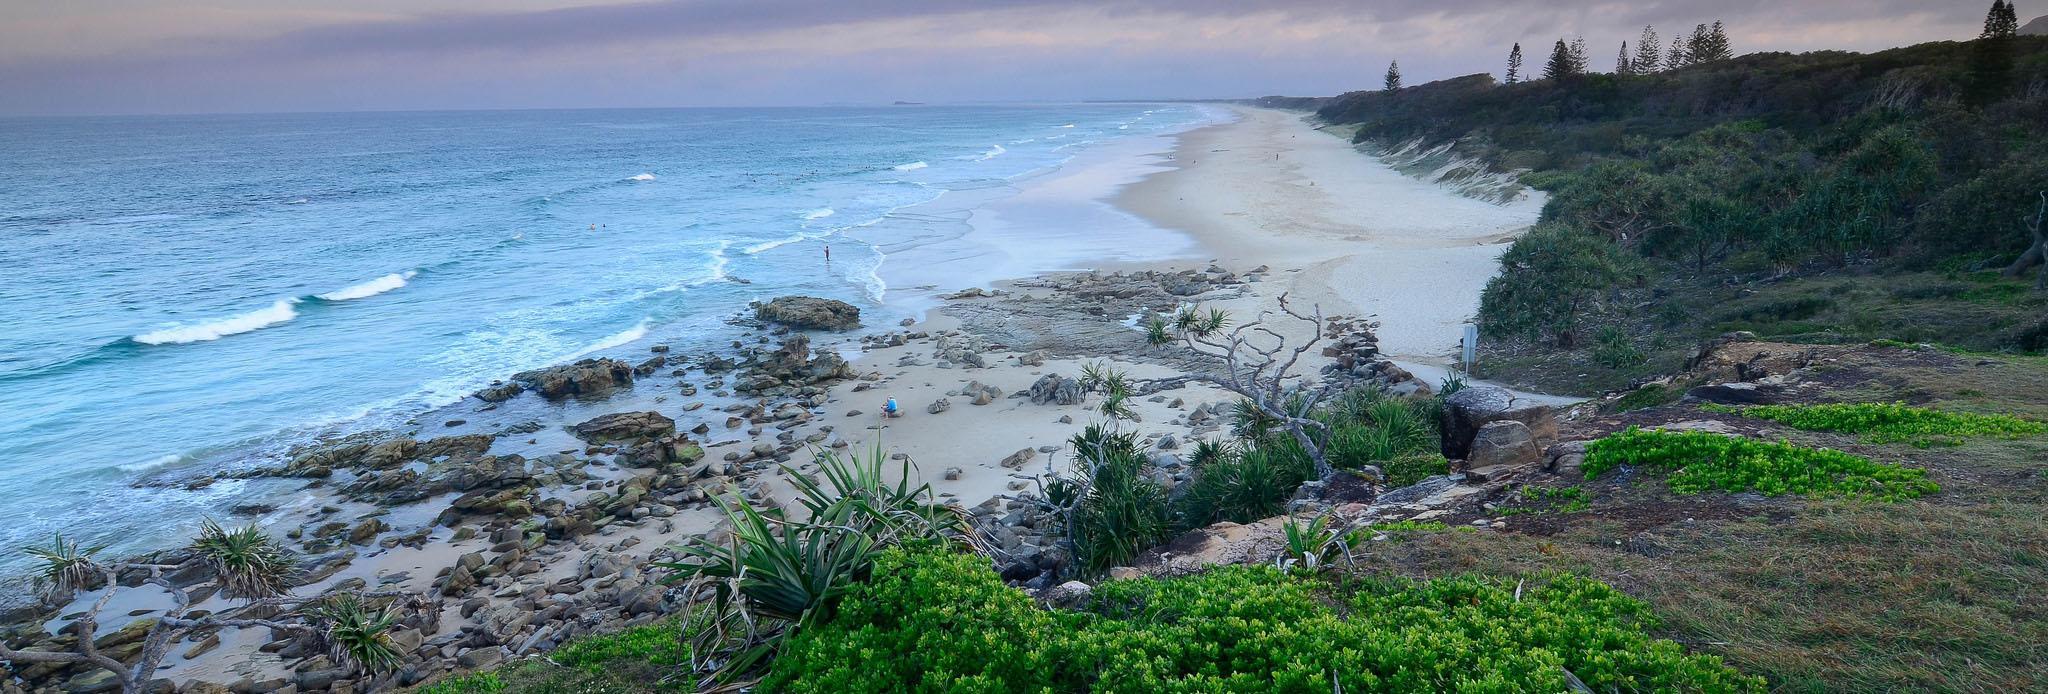 Yaroomba-a Sunshine Coast jewel